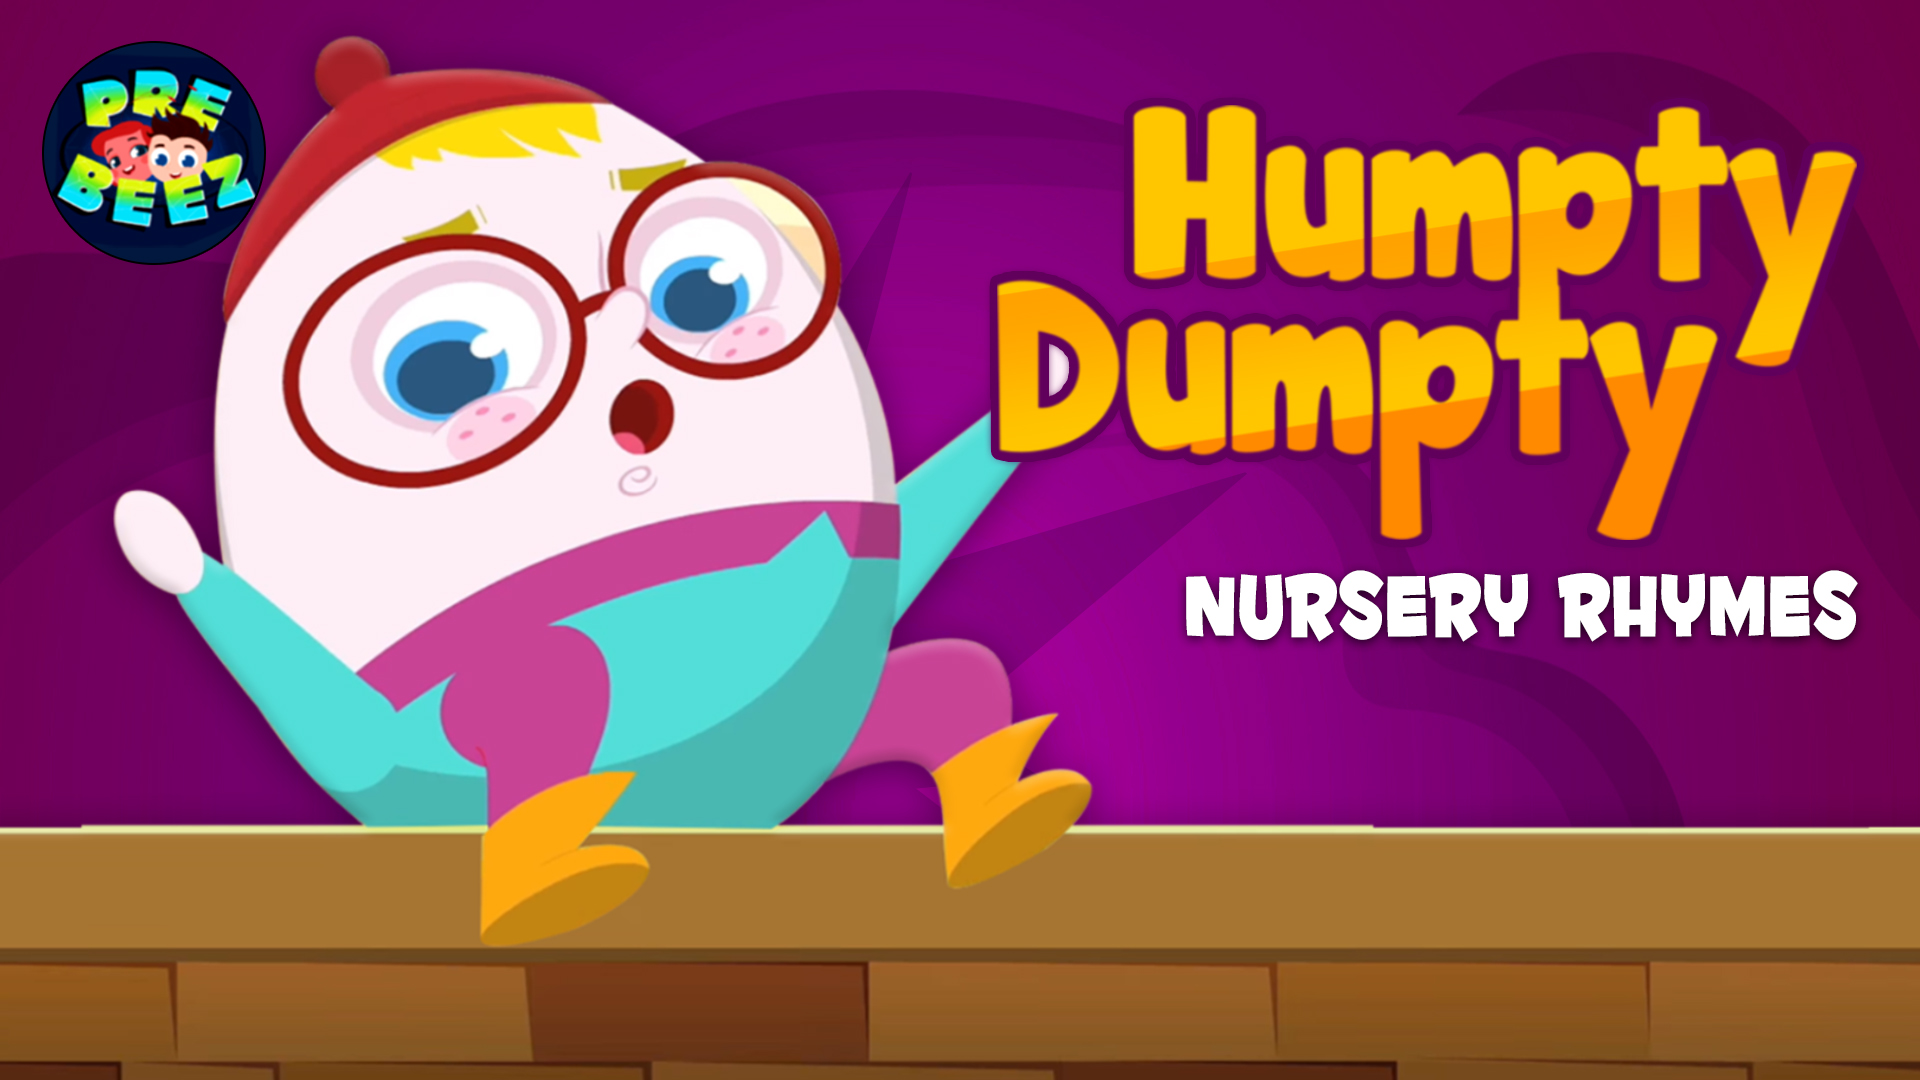 Humpty Dumpty Nursery Rhymes - Preebeez